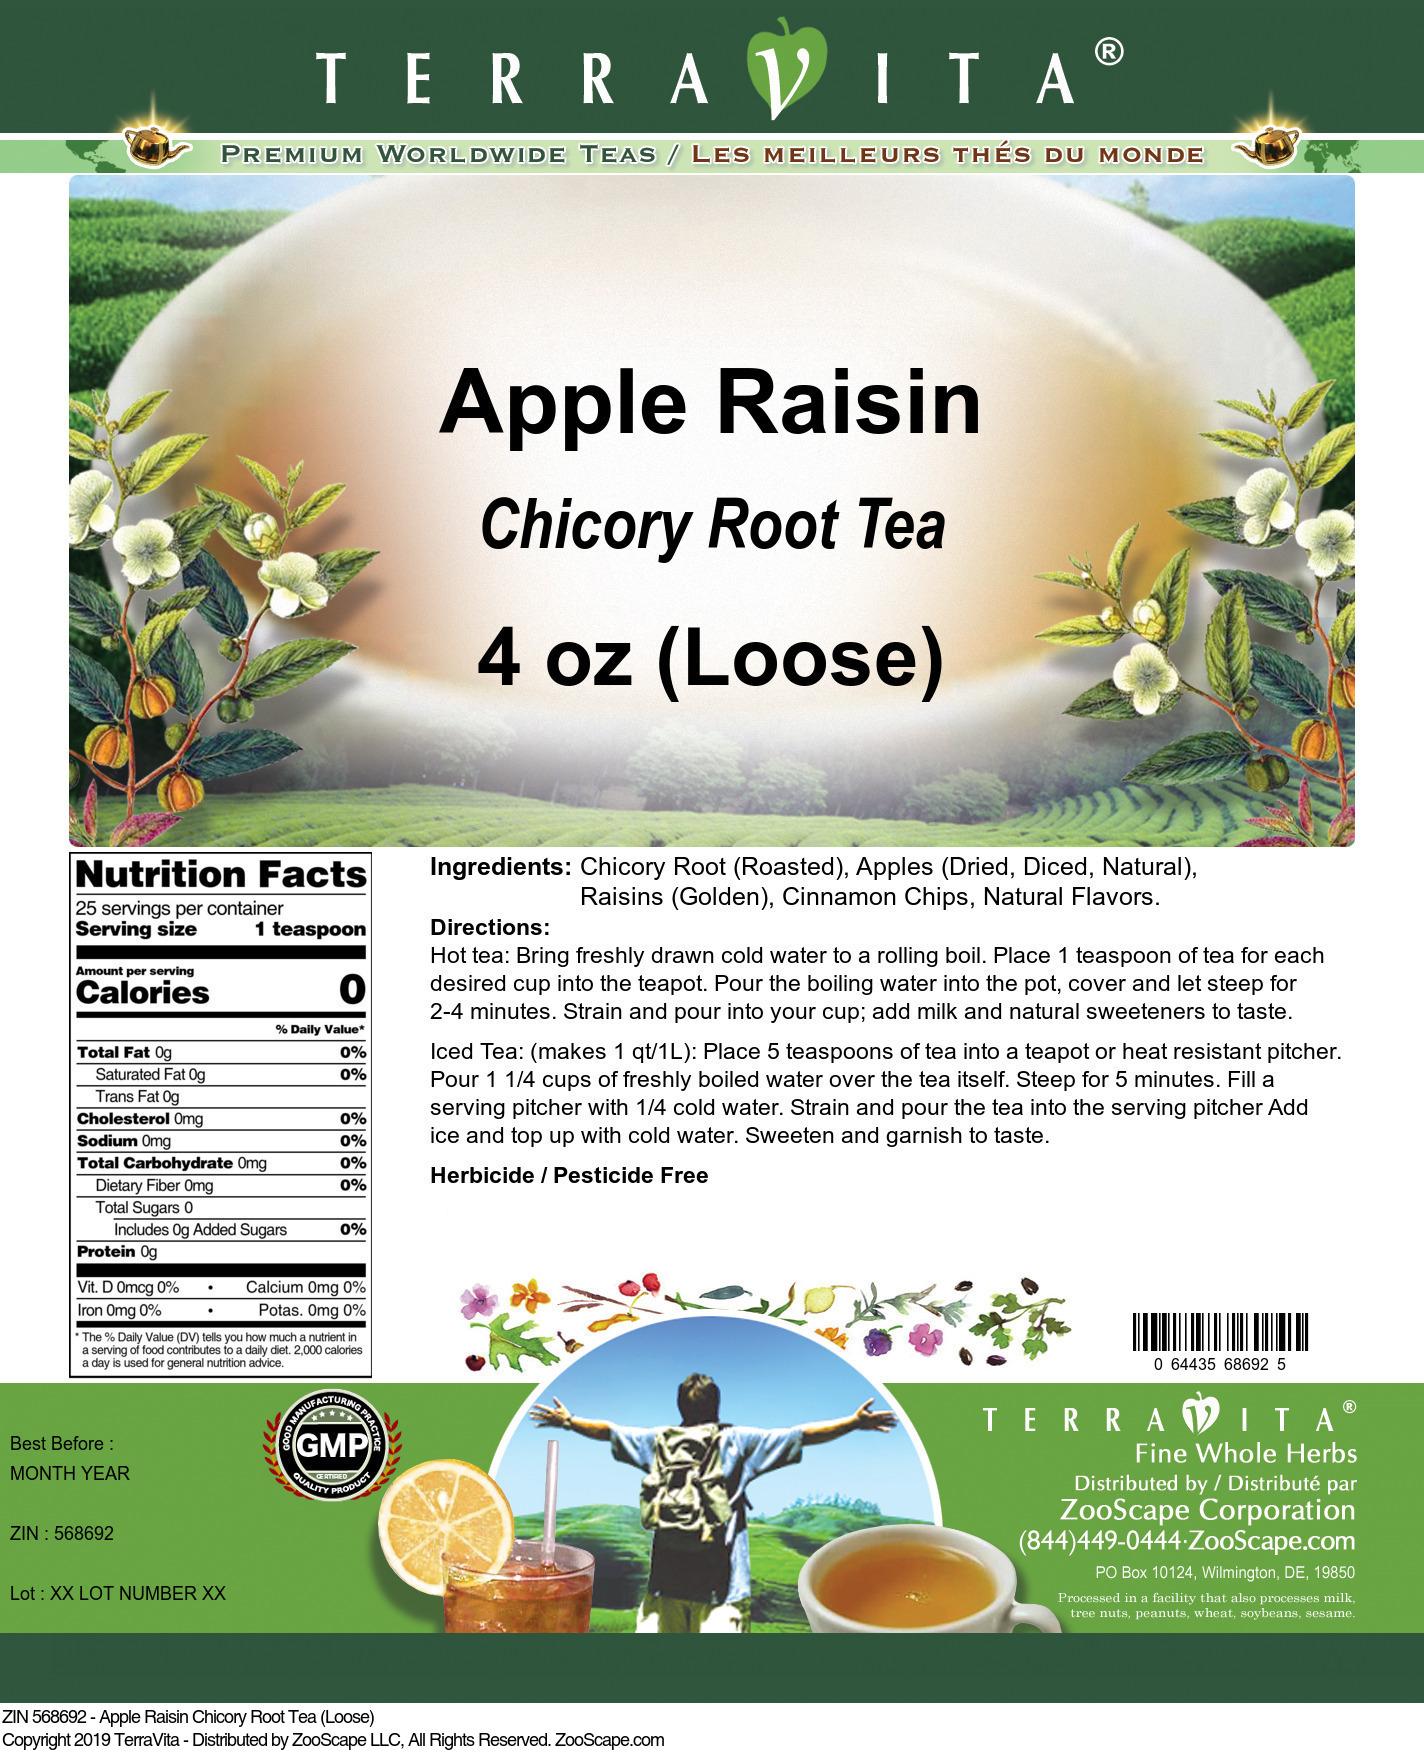 Apple Raisin Chicory Root Tea (Loose)